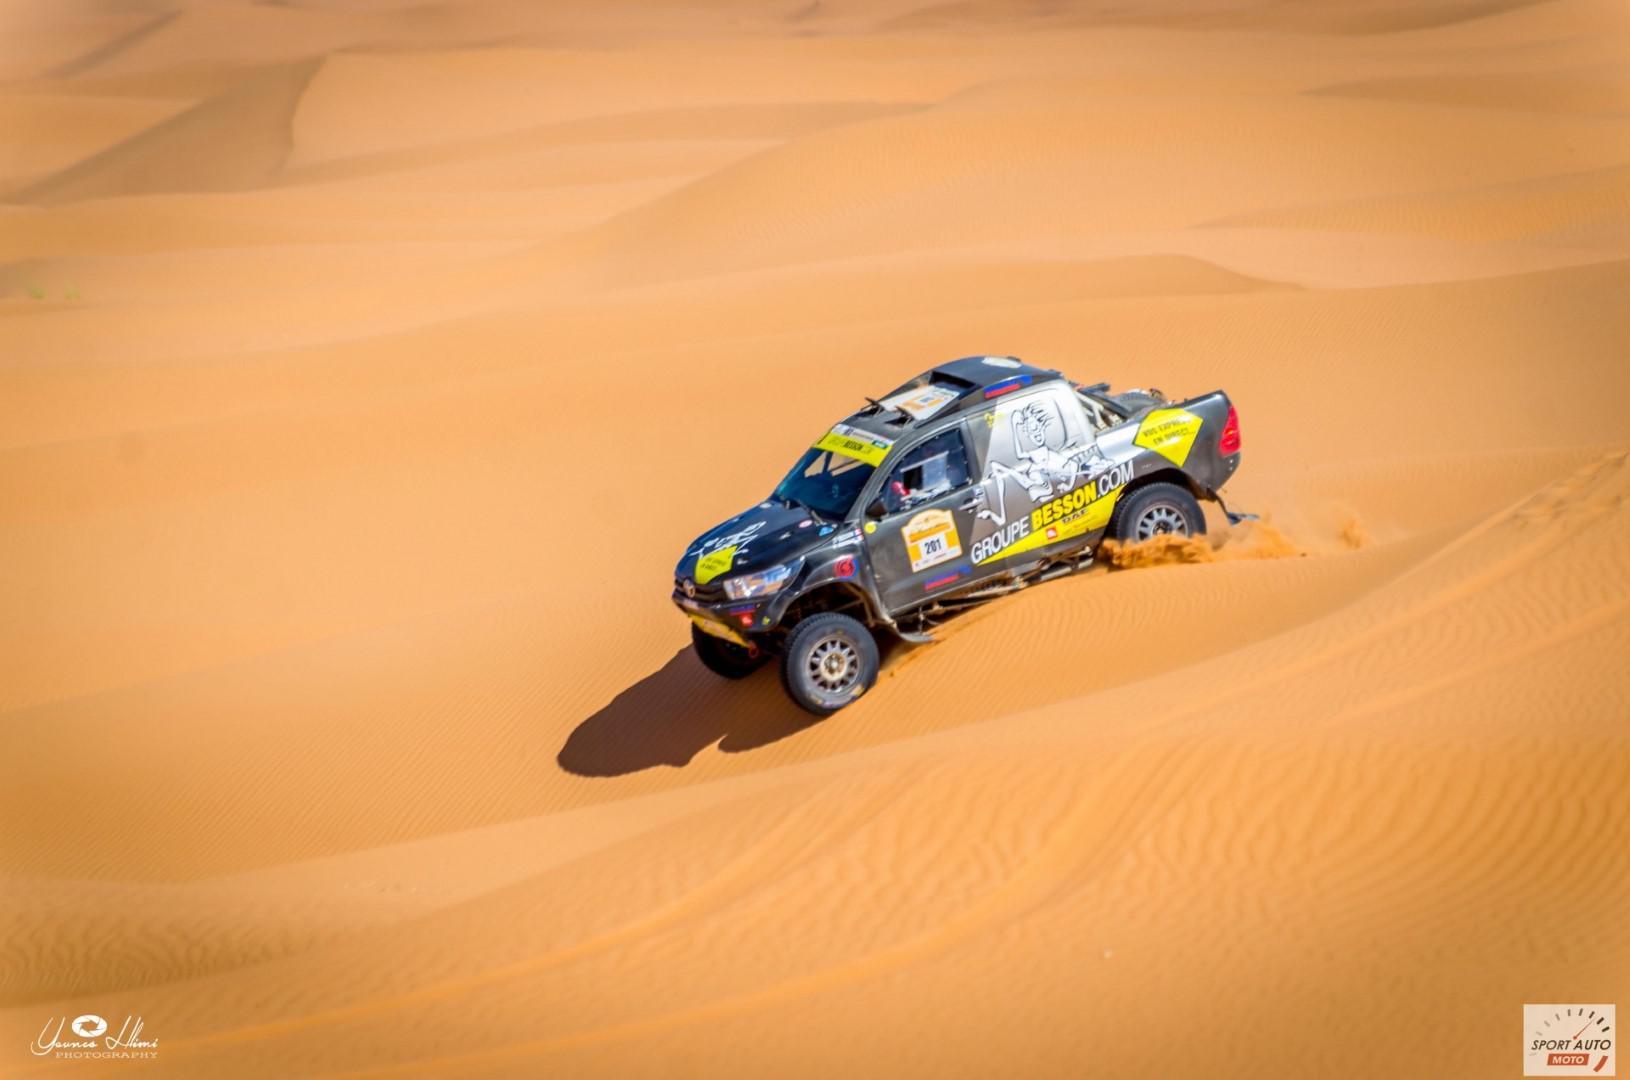 Rallye Hearts of Morocco 2017 : Besson remporte la première édition